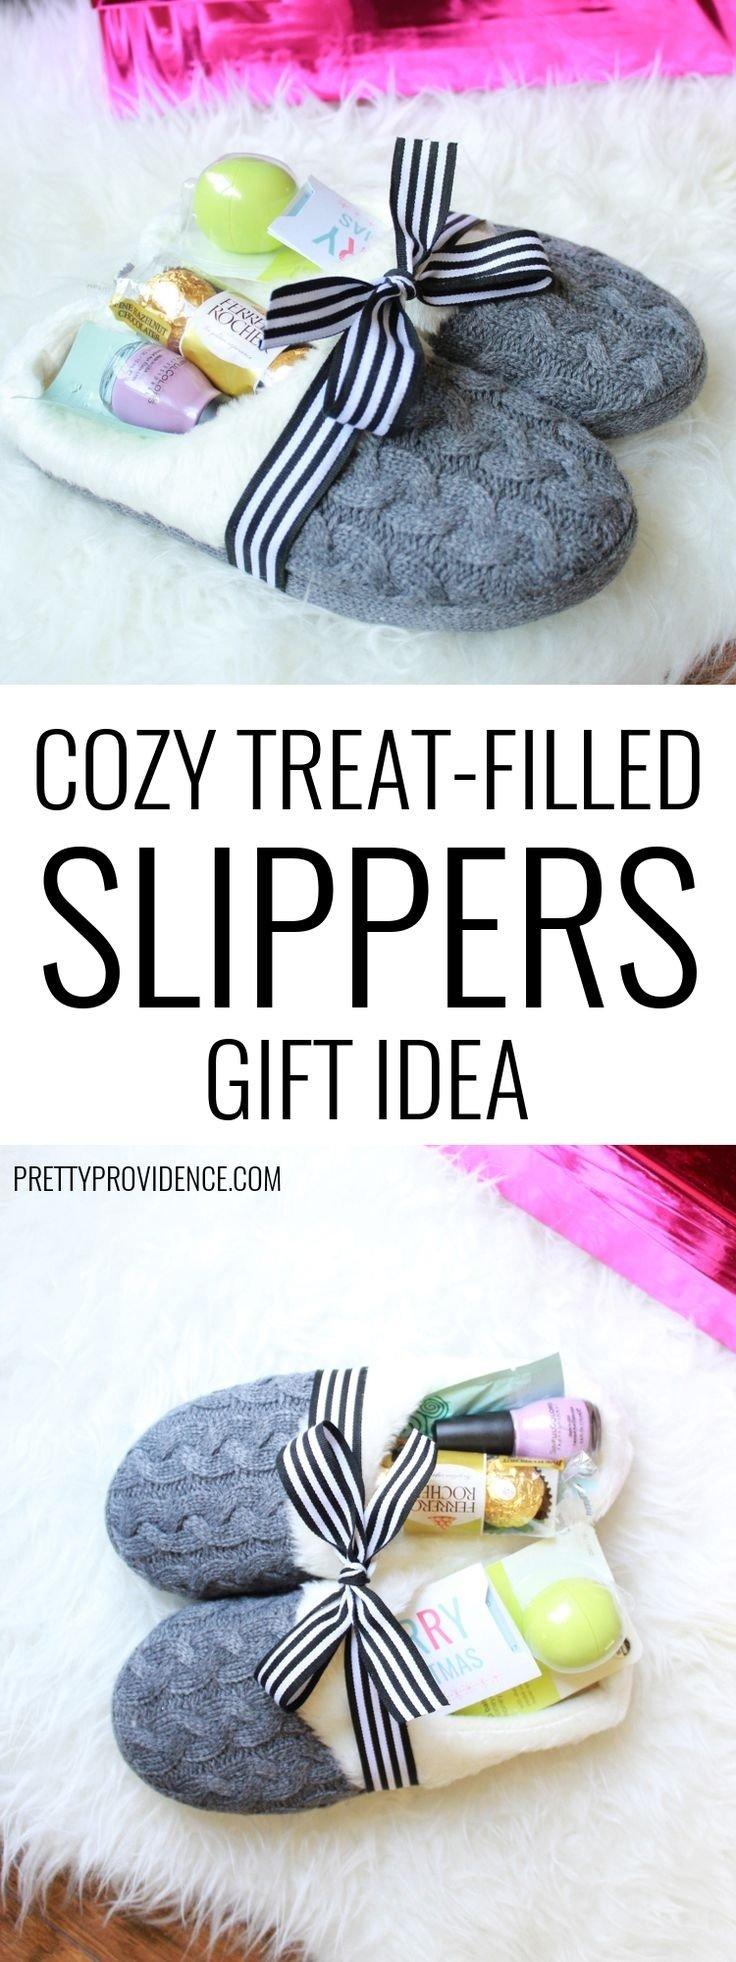 10 Fantastic Secret Santa Ideas For School 431 best teacher gifts fun puns images on pinterest teacher gifts 2020